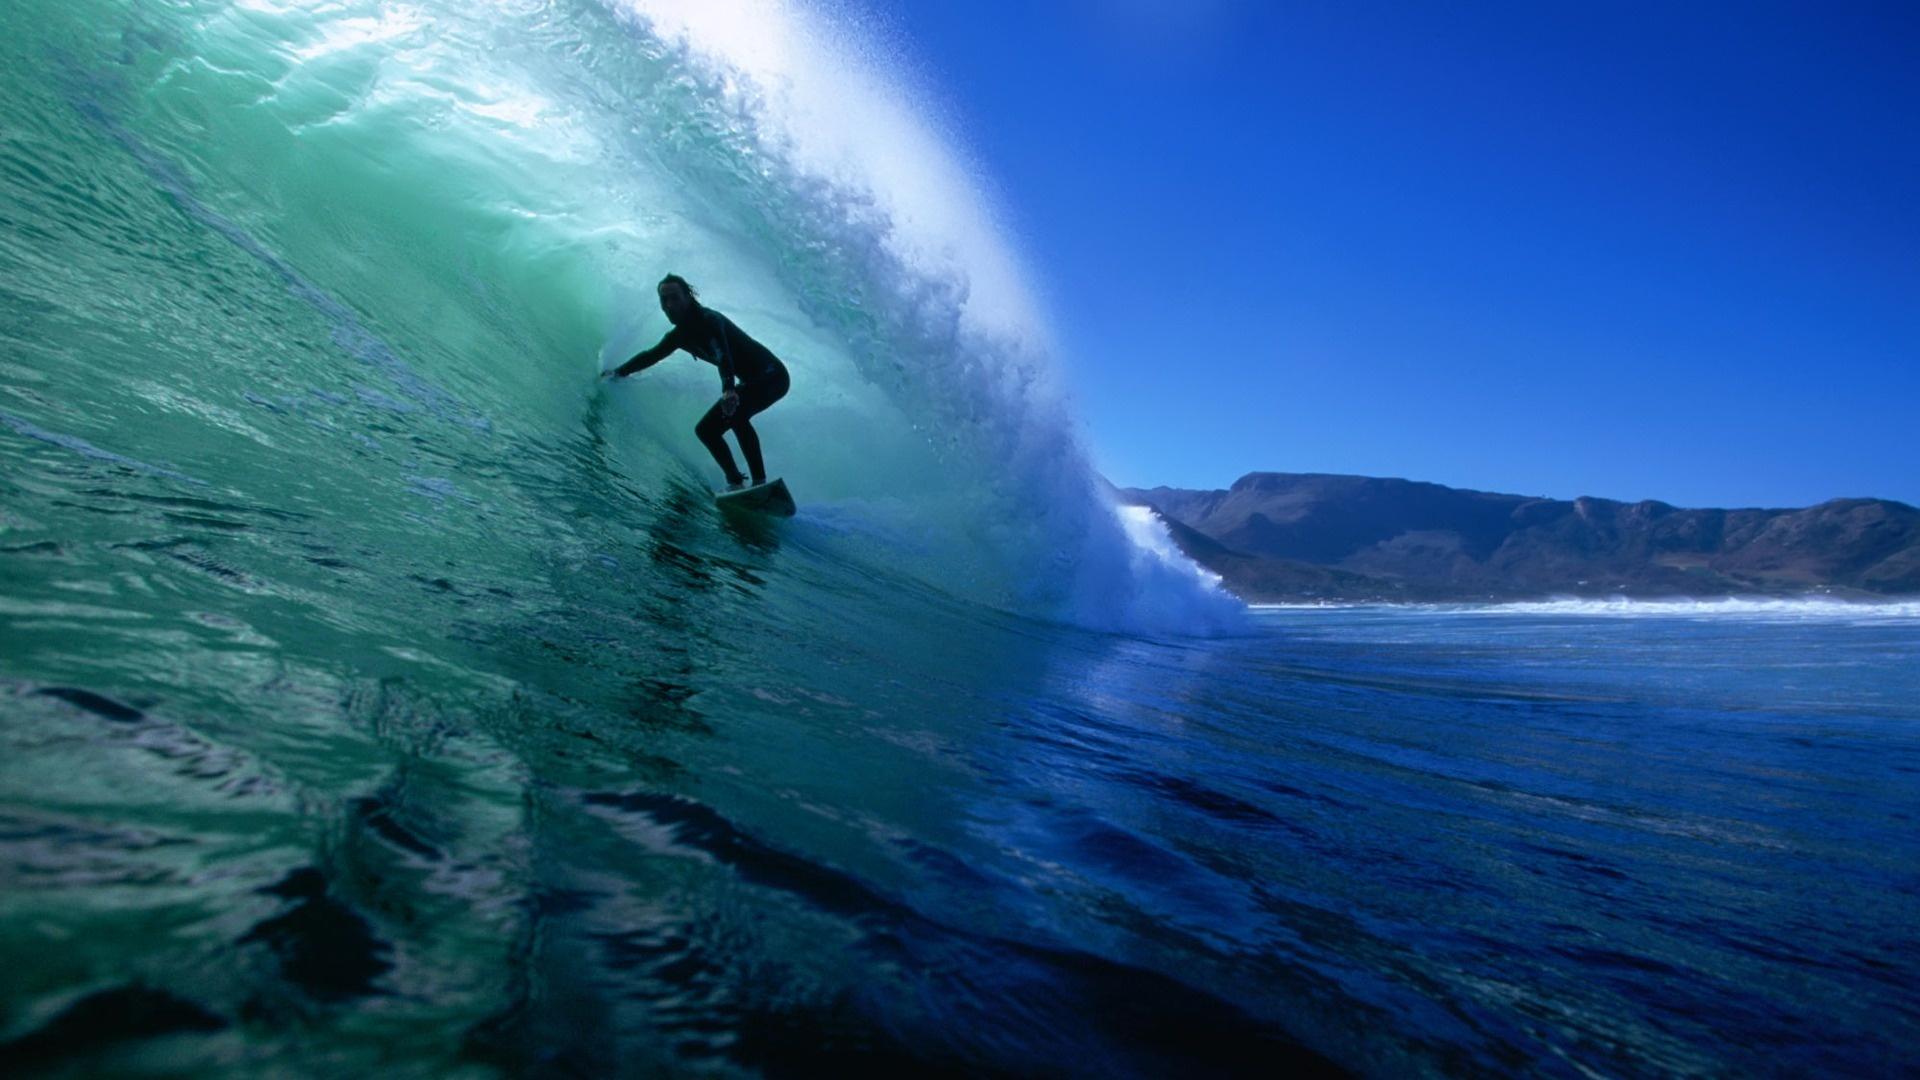 surfing wallpaper cool desktop background share this cool desktop 1920x1080